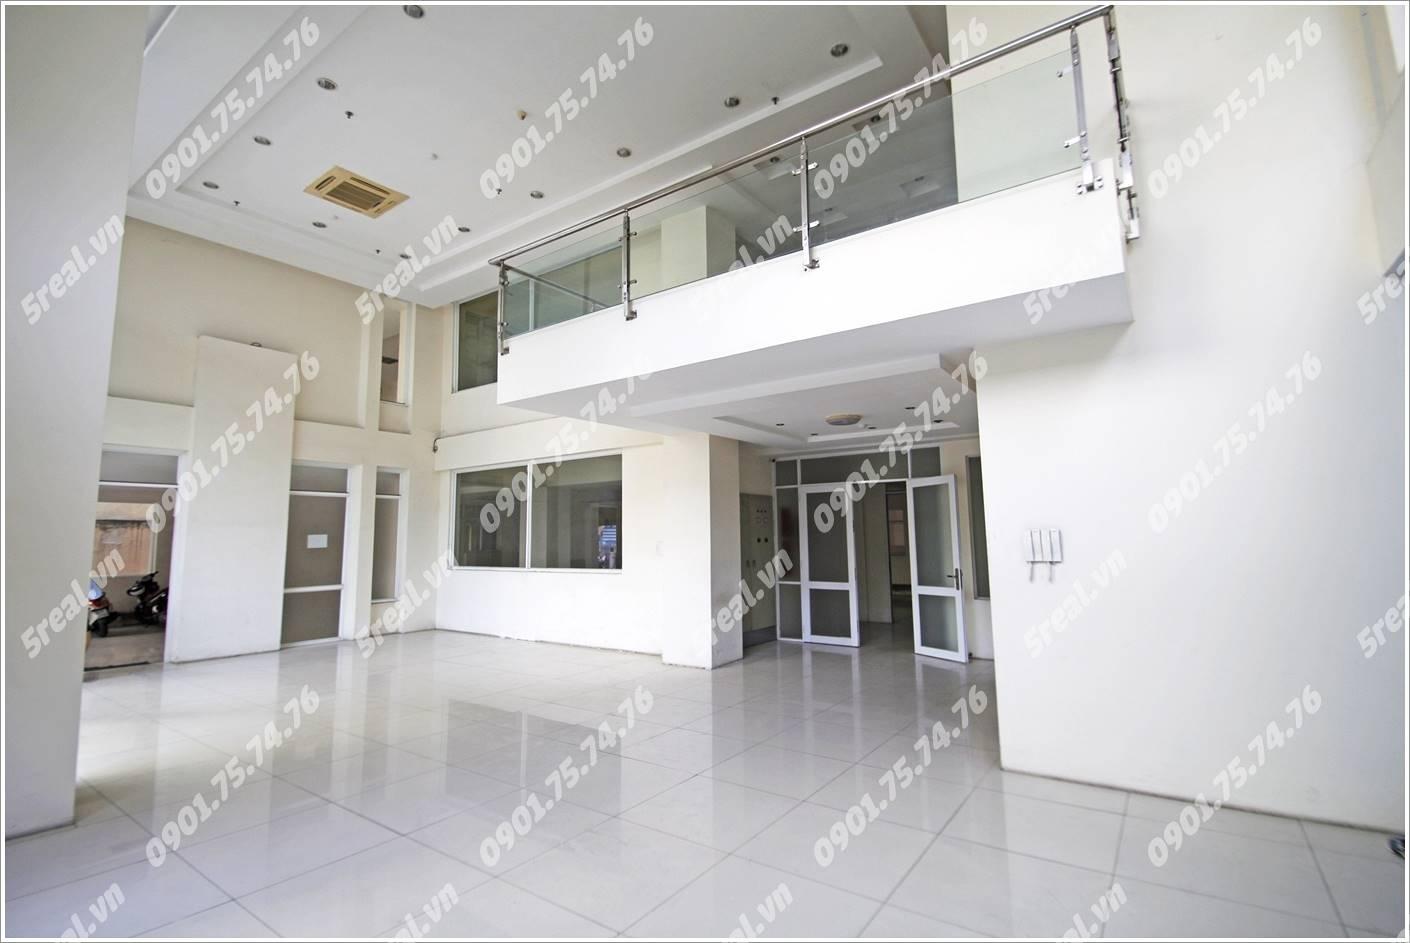 halo-le-trung-nghia-building-quan-tan-binh-van-phong-cho-thue-5real.vn-03